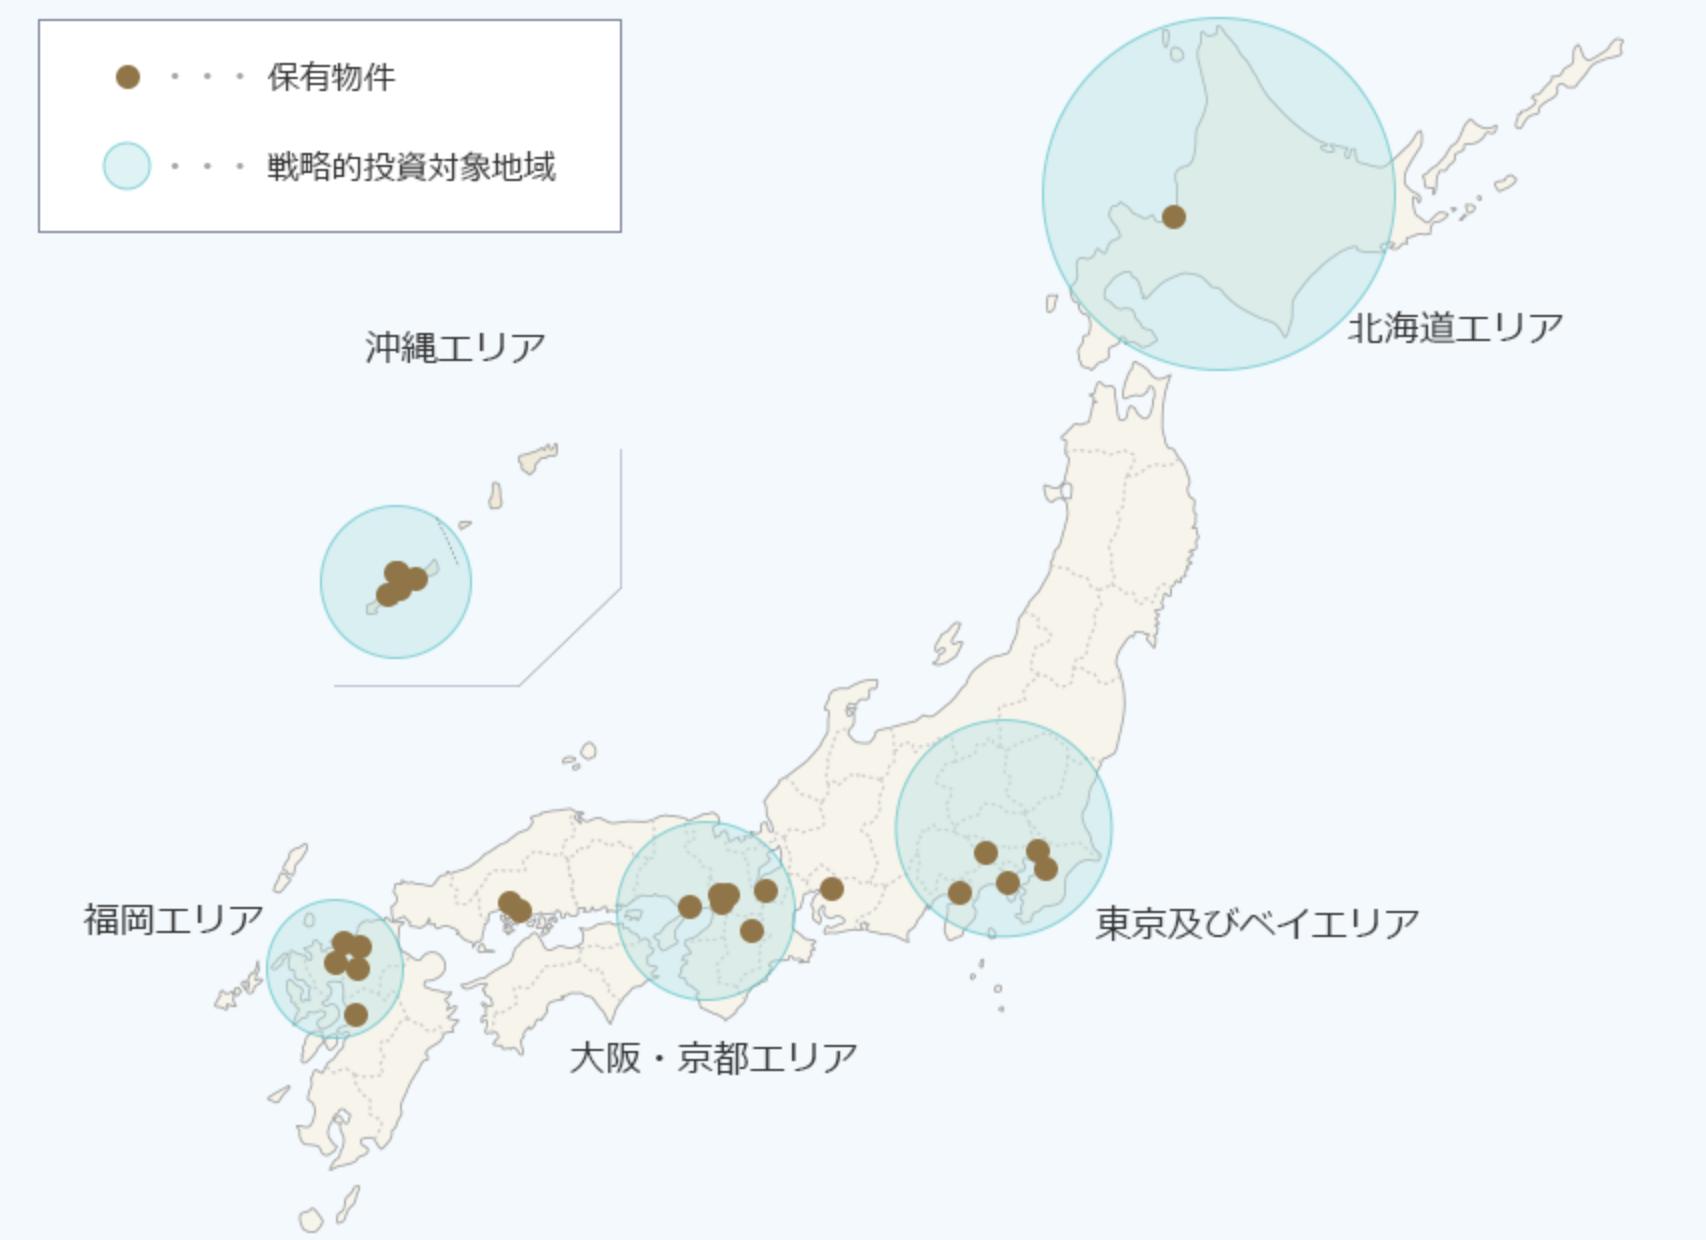 JHRの物件エリアポートフォリオマップ